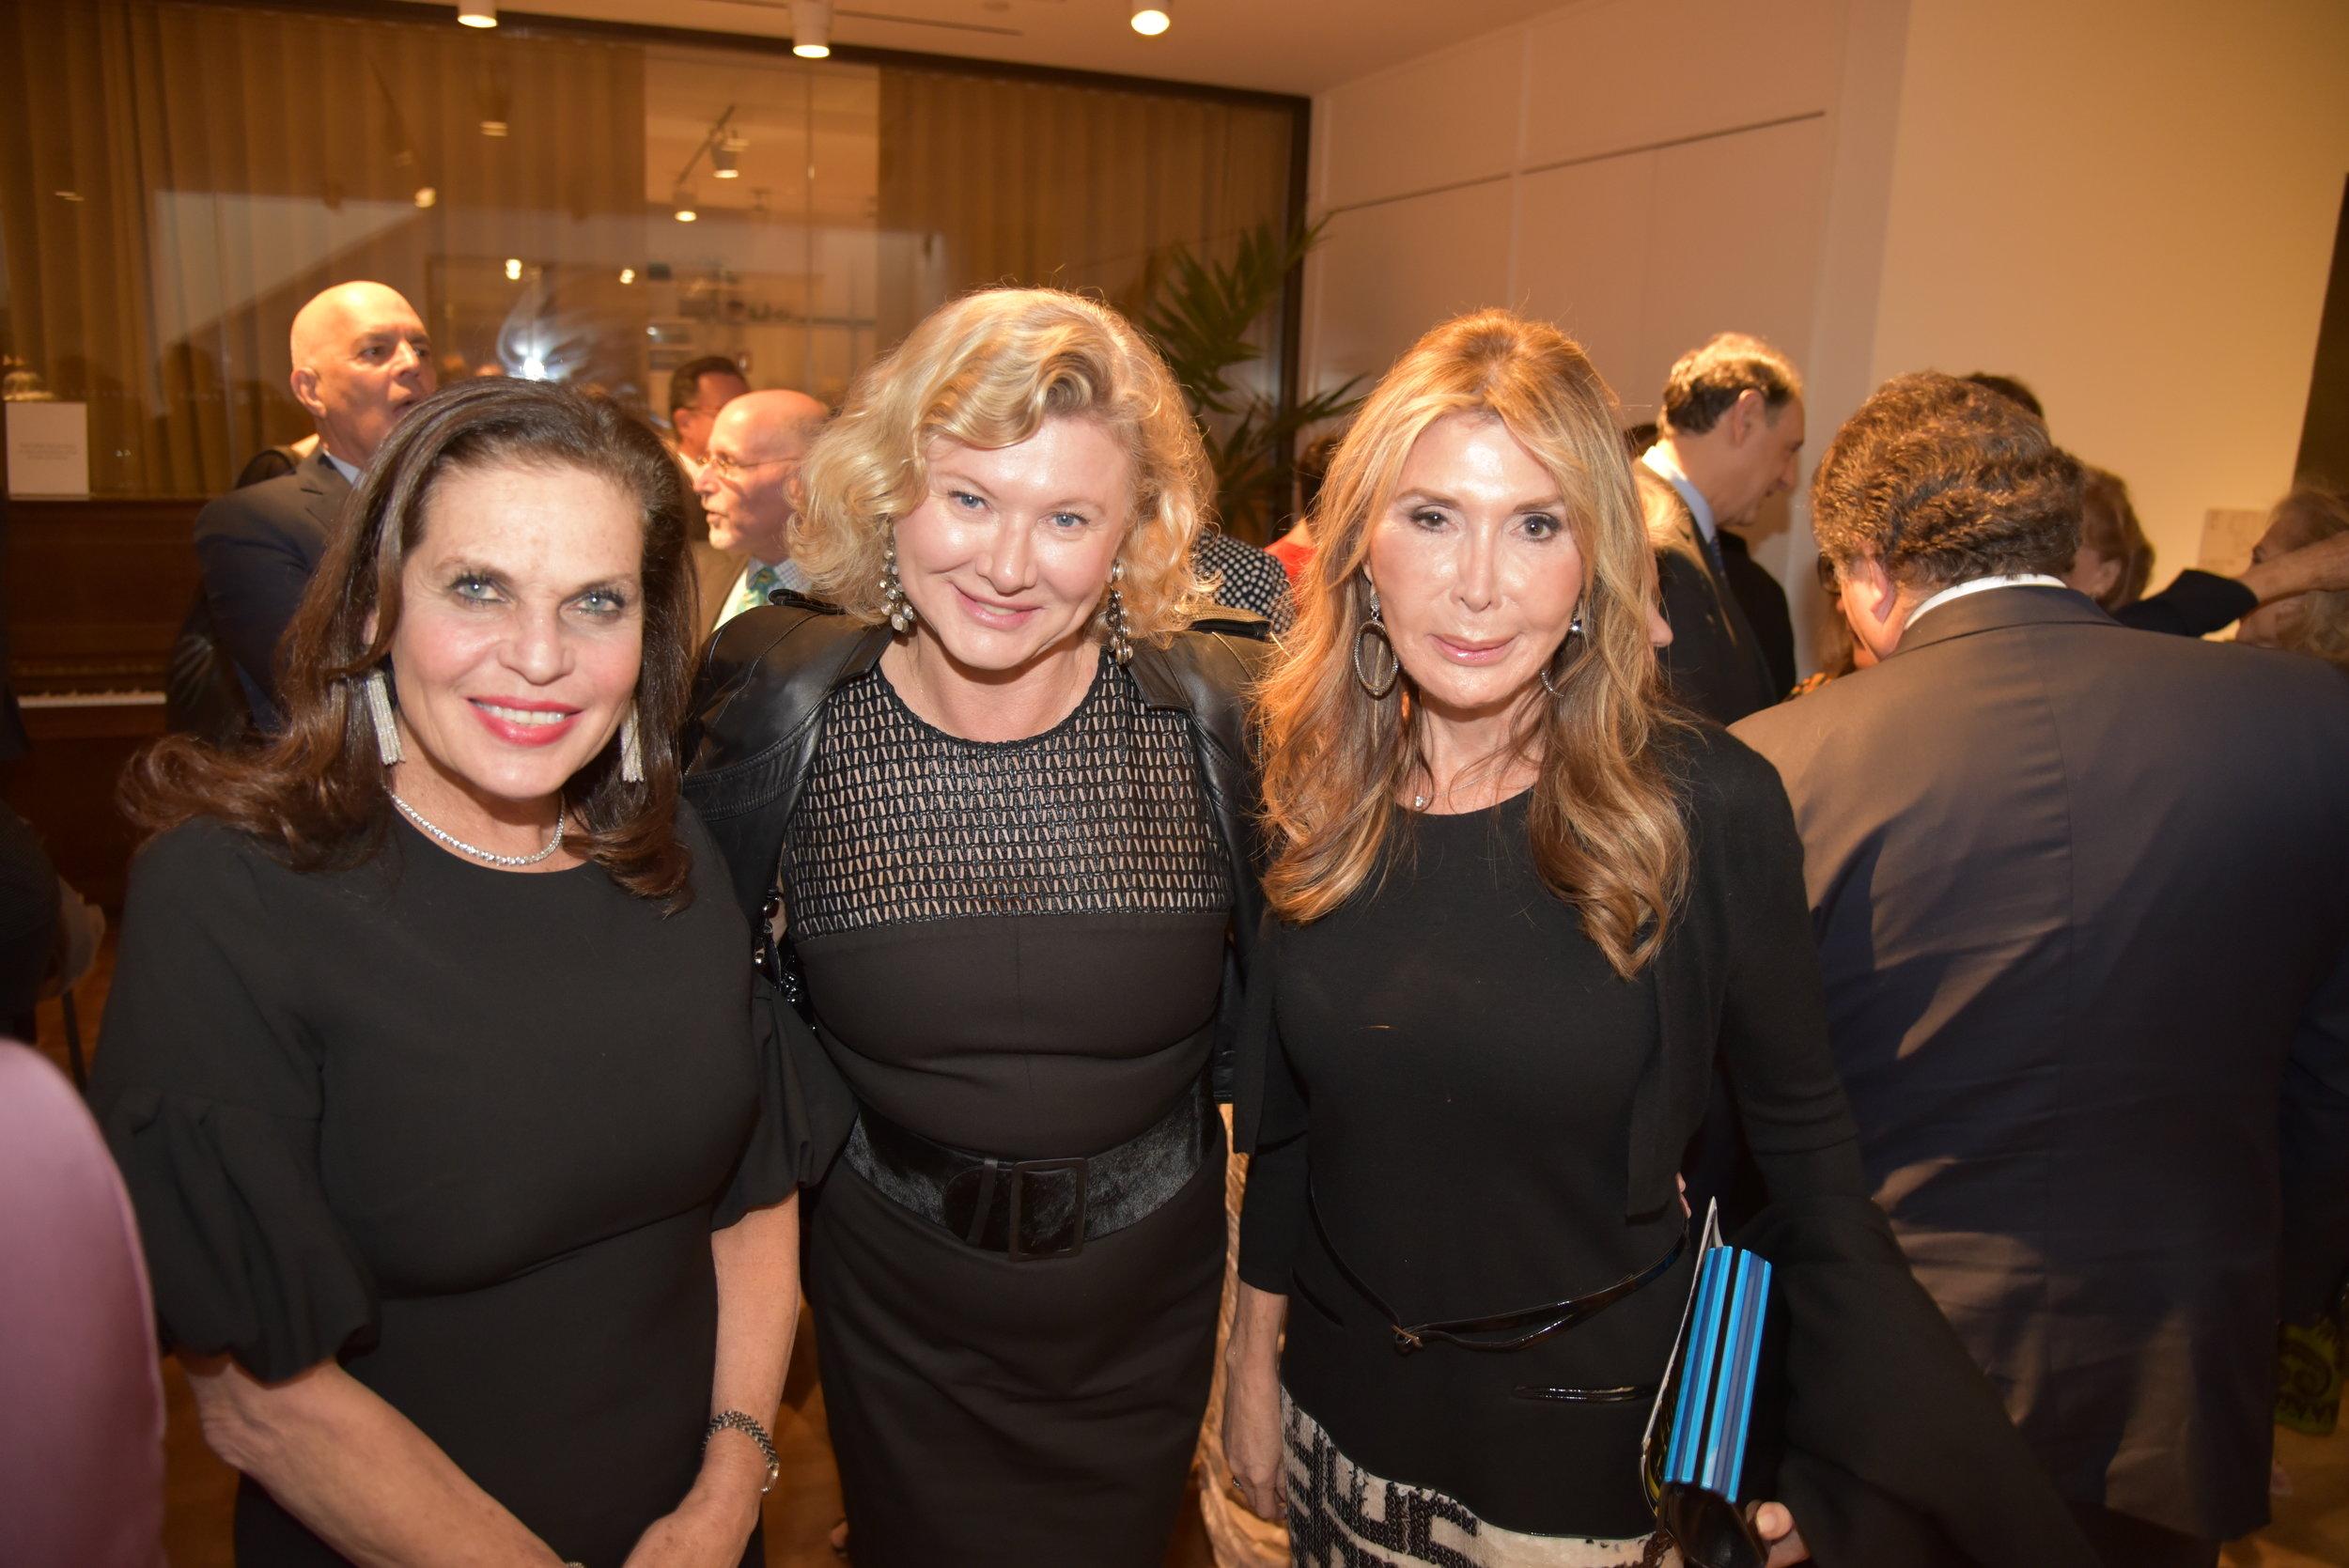 AWA_3572 Sylvia Hemingway, Lady Liliana Cavendish, Cheri Kaufman.JPG